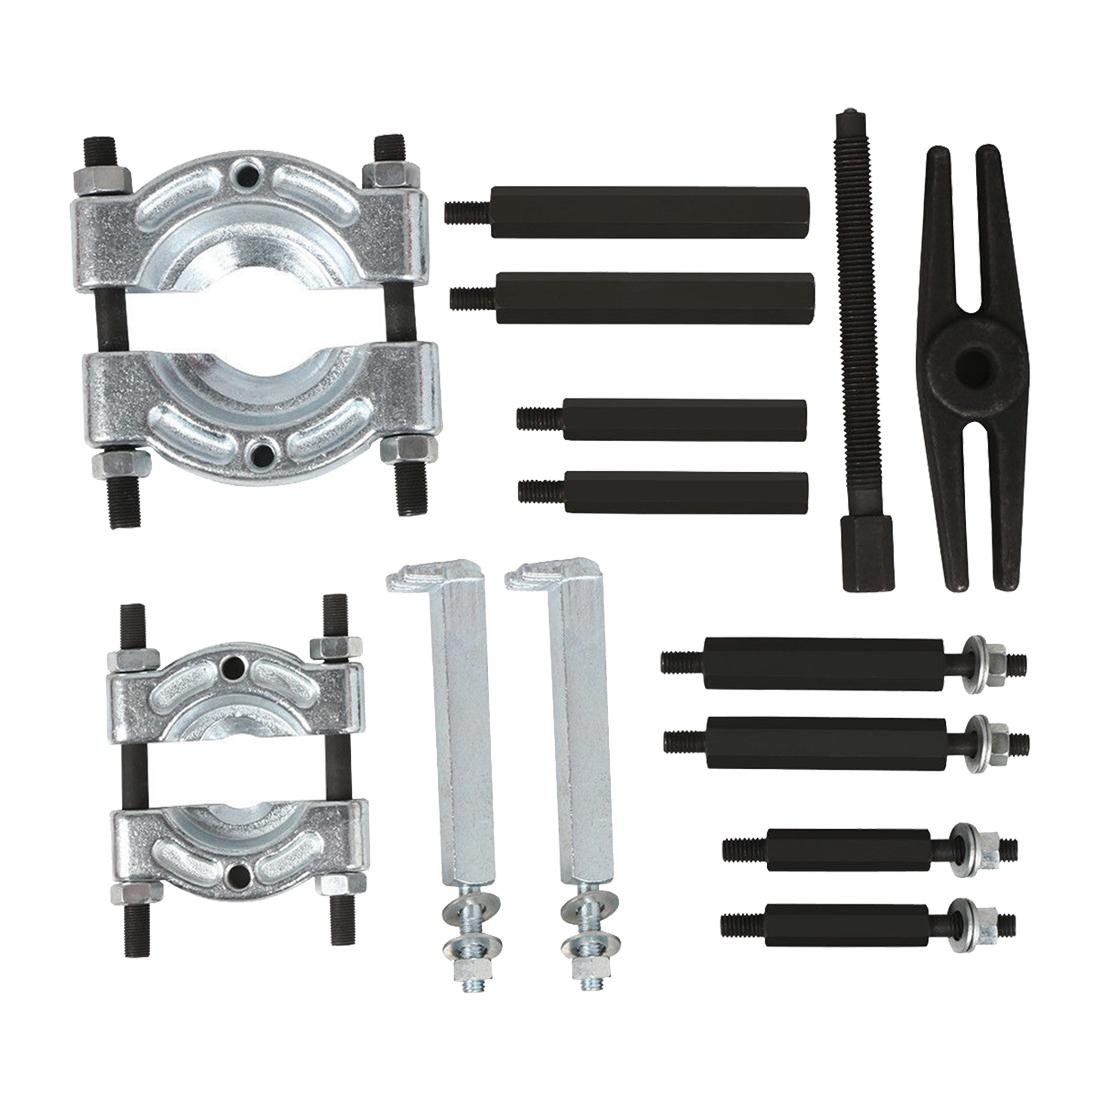 Bearing Puller Material : Bearing puller separator set quot splitters long jaw gear